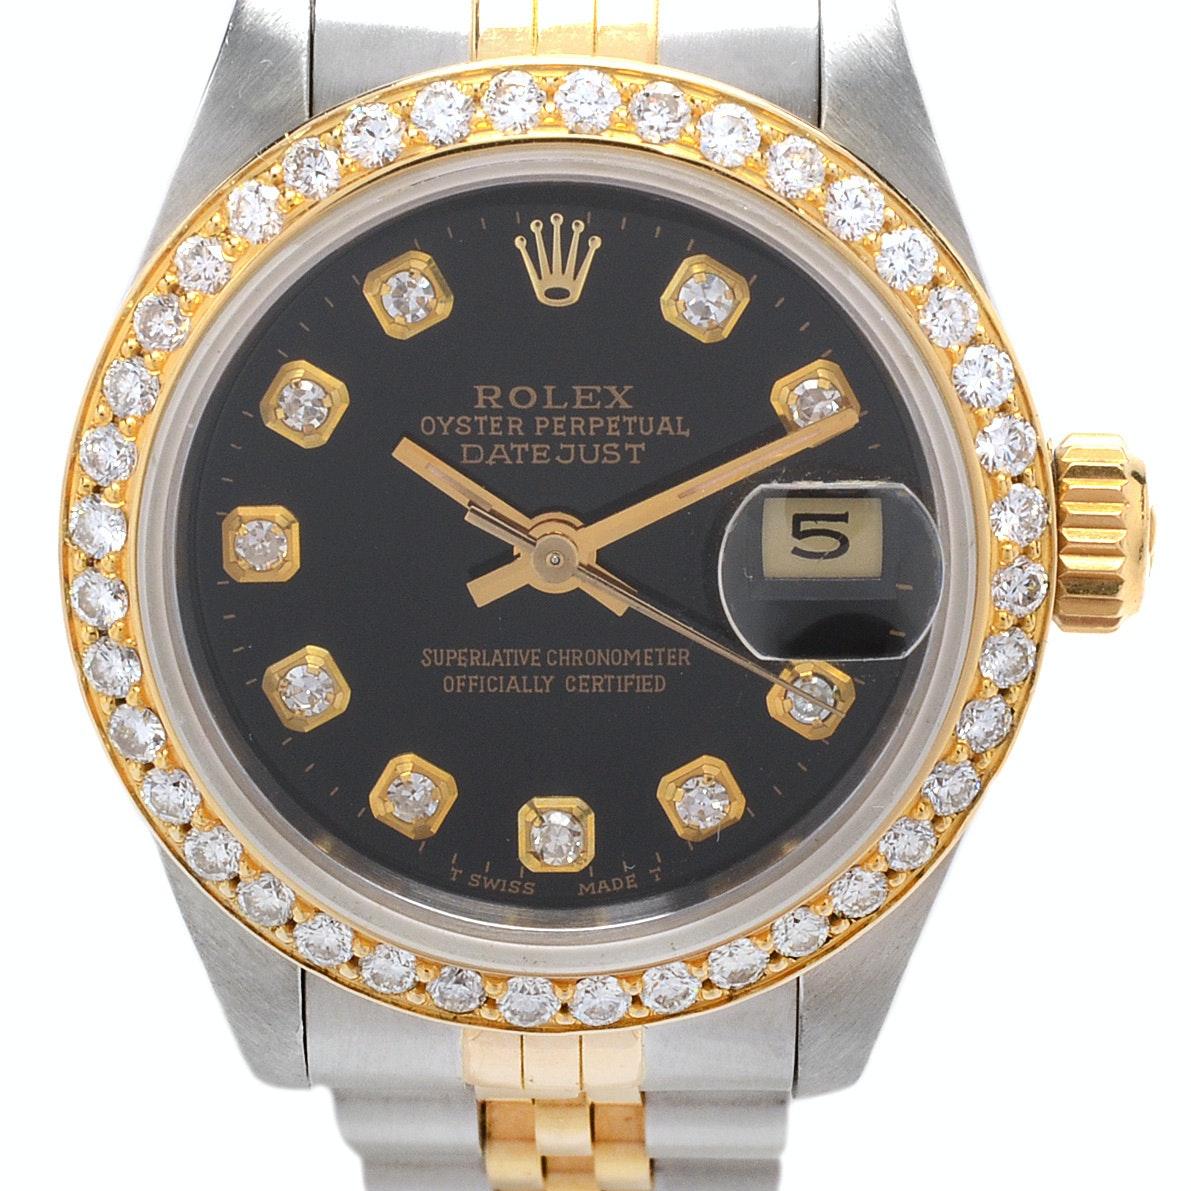 Rolex Datejust 18K Gold and Steel Diamond Bezel Automatic Wristwatch